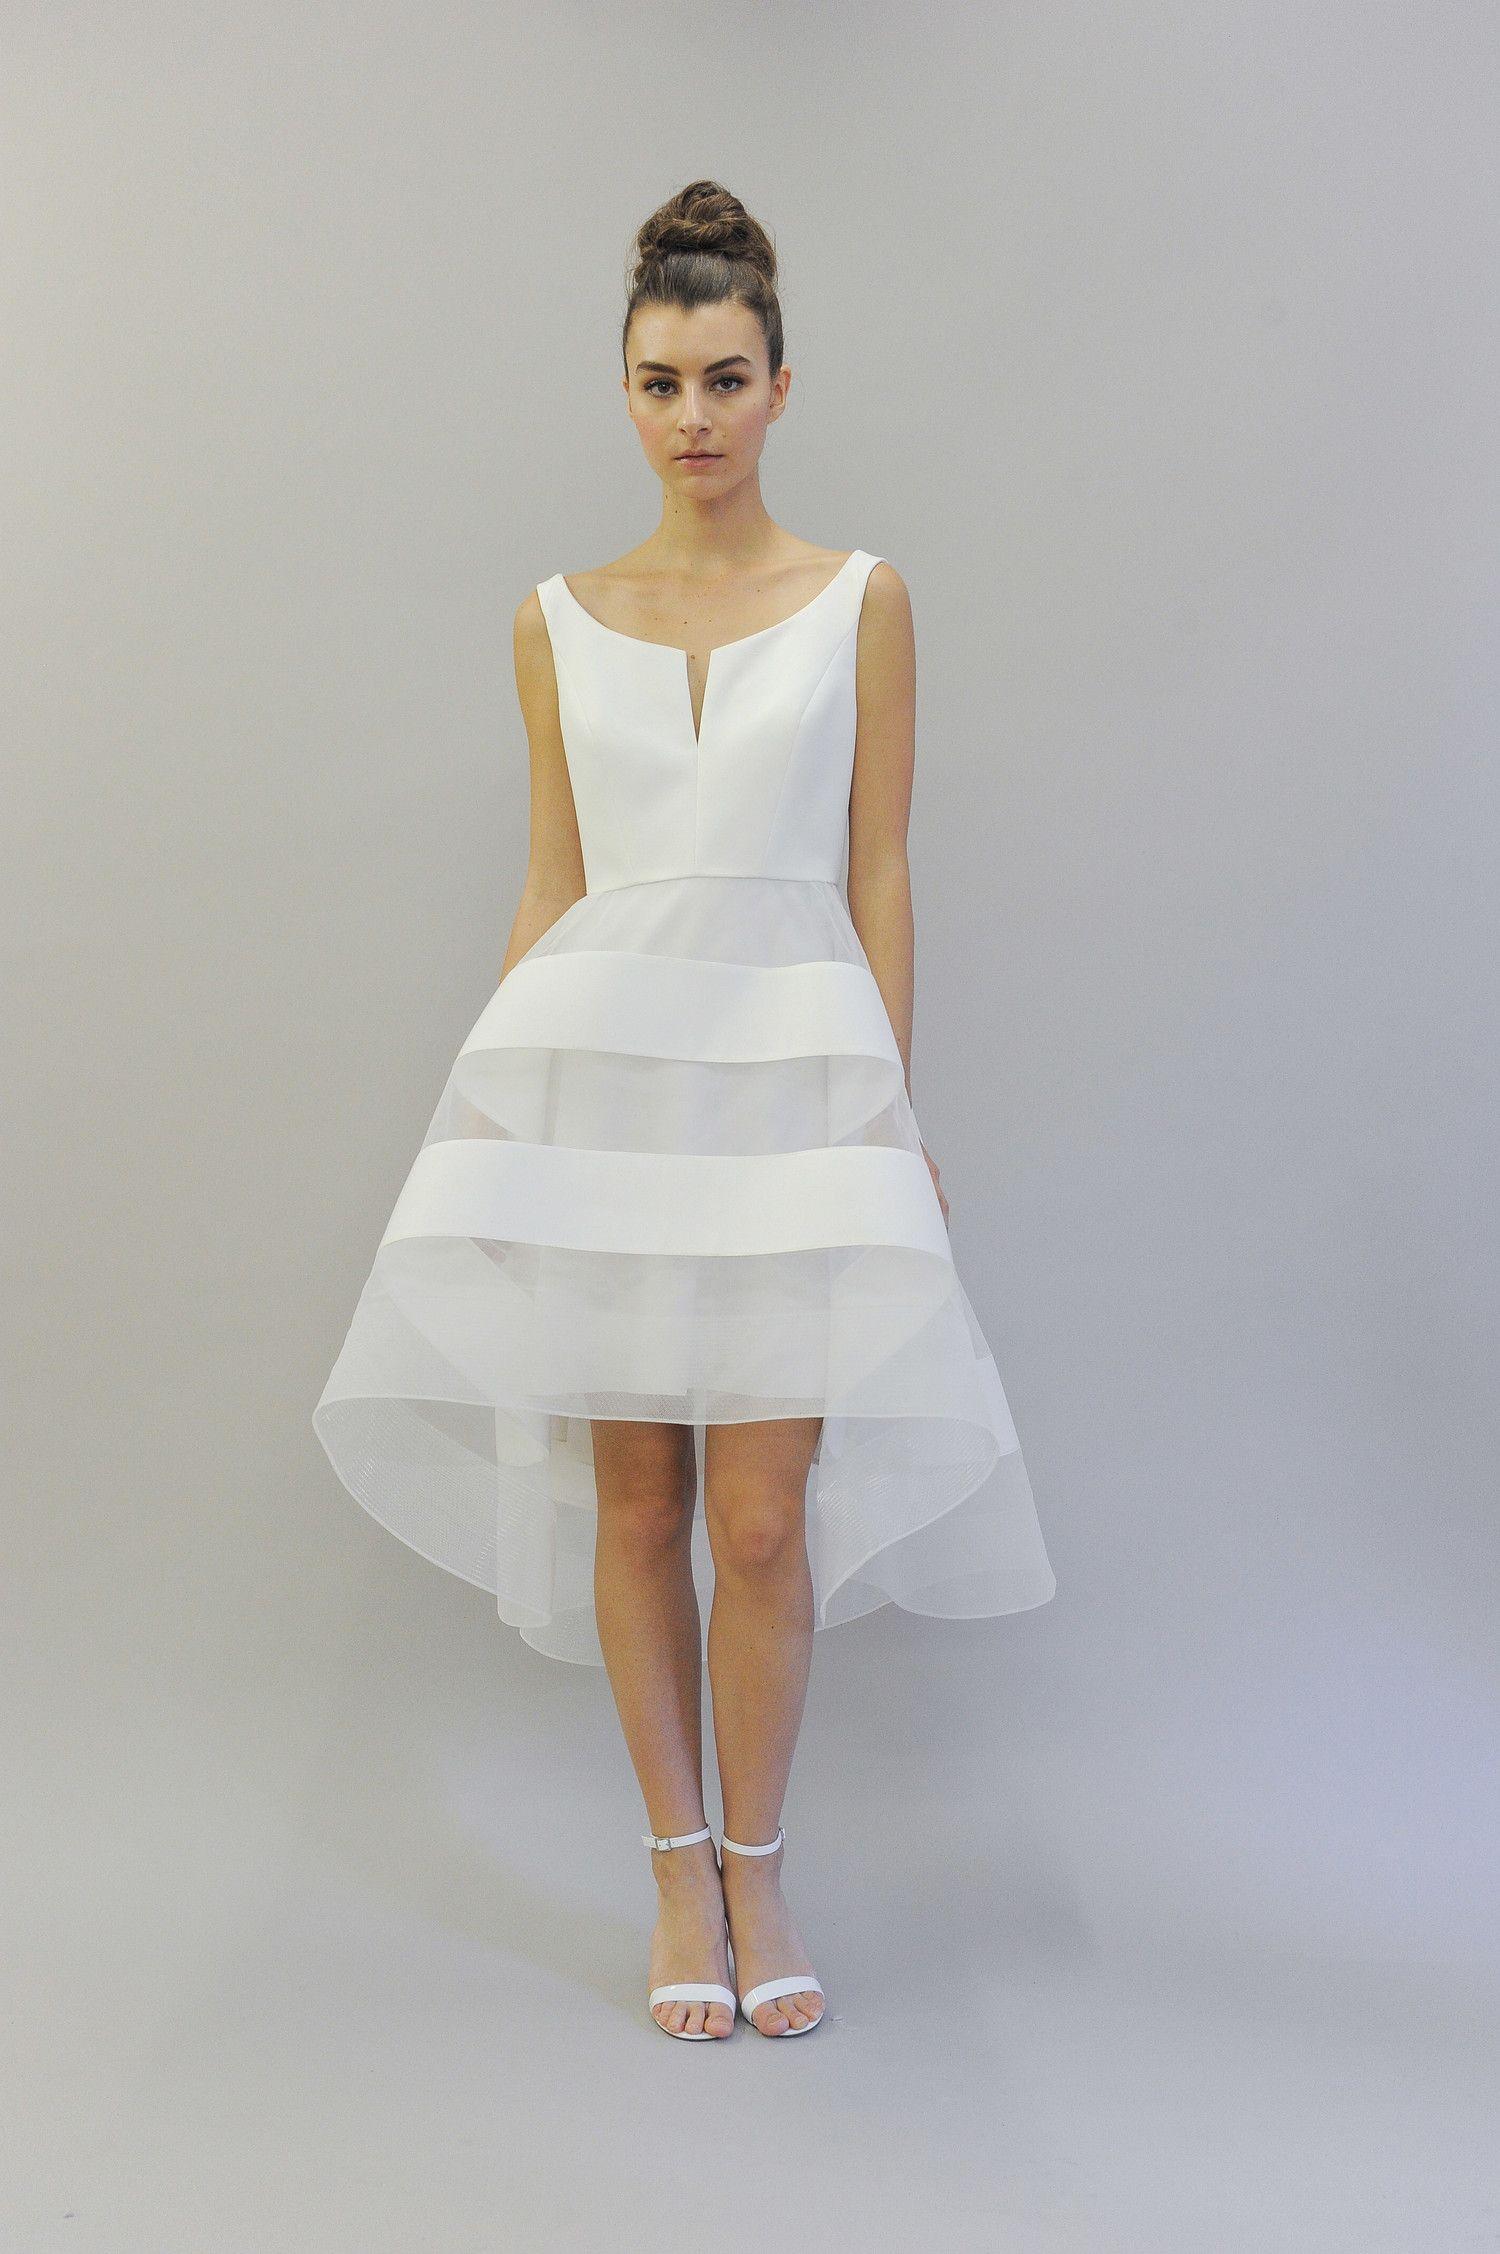 Chic Short Wedding Dresses Boat Neck Wedding Dress Short Wedding Dress Nontraditional Wedding Dress [ 2254 x 1500 Pixel ]